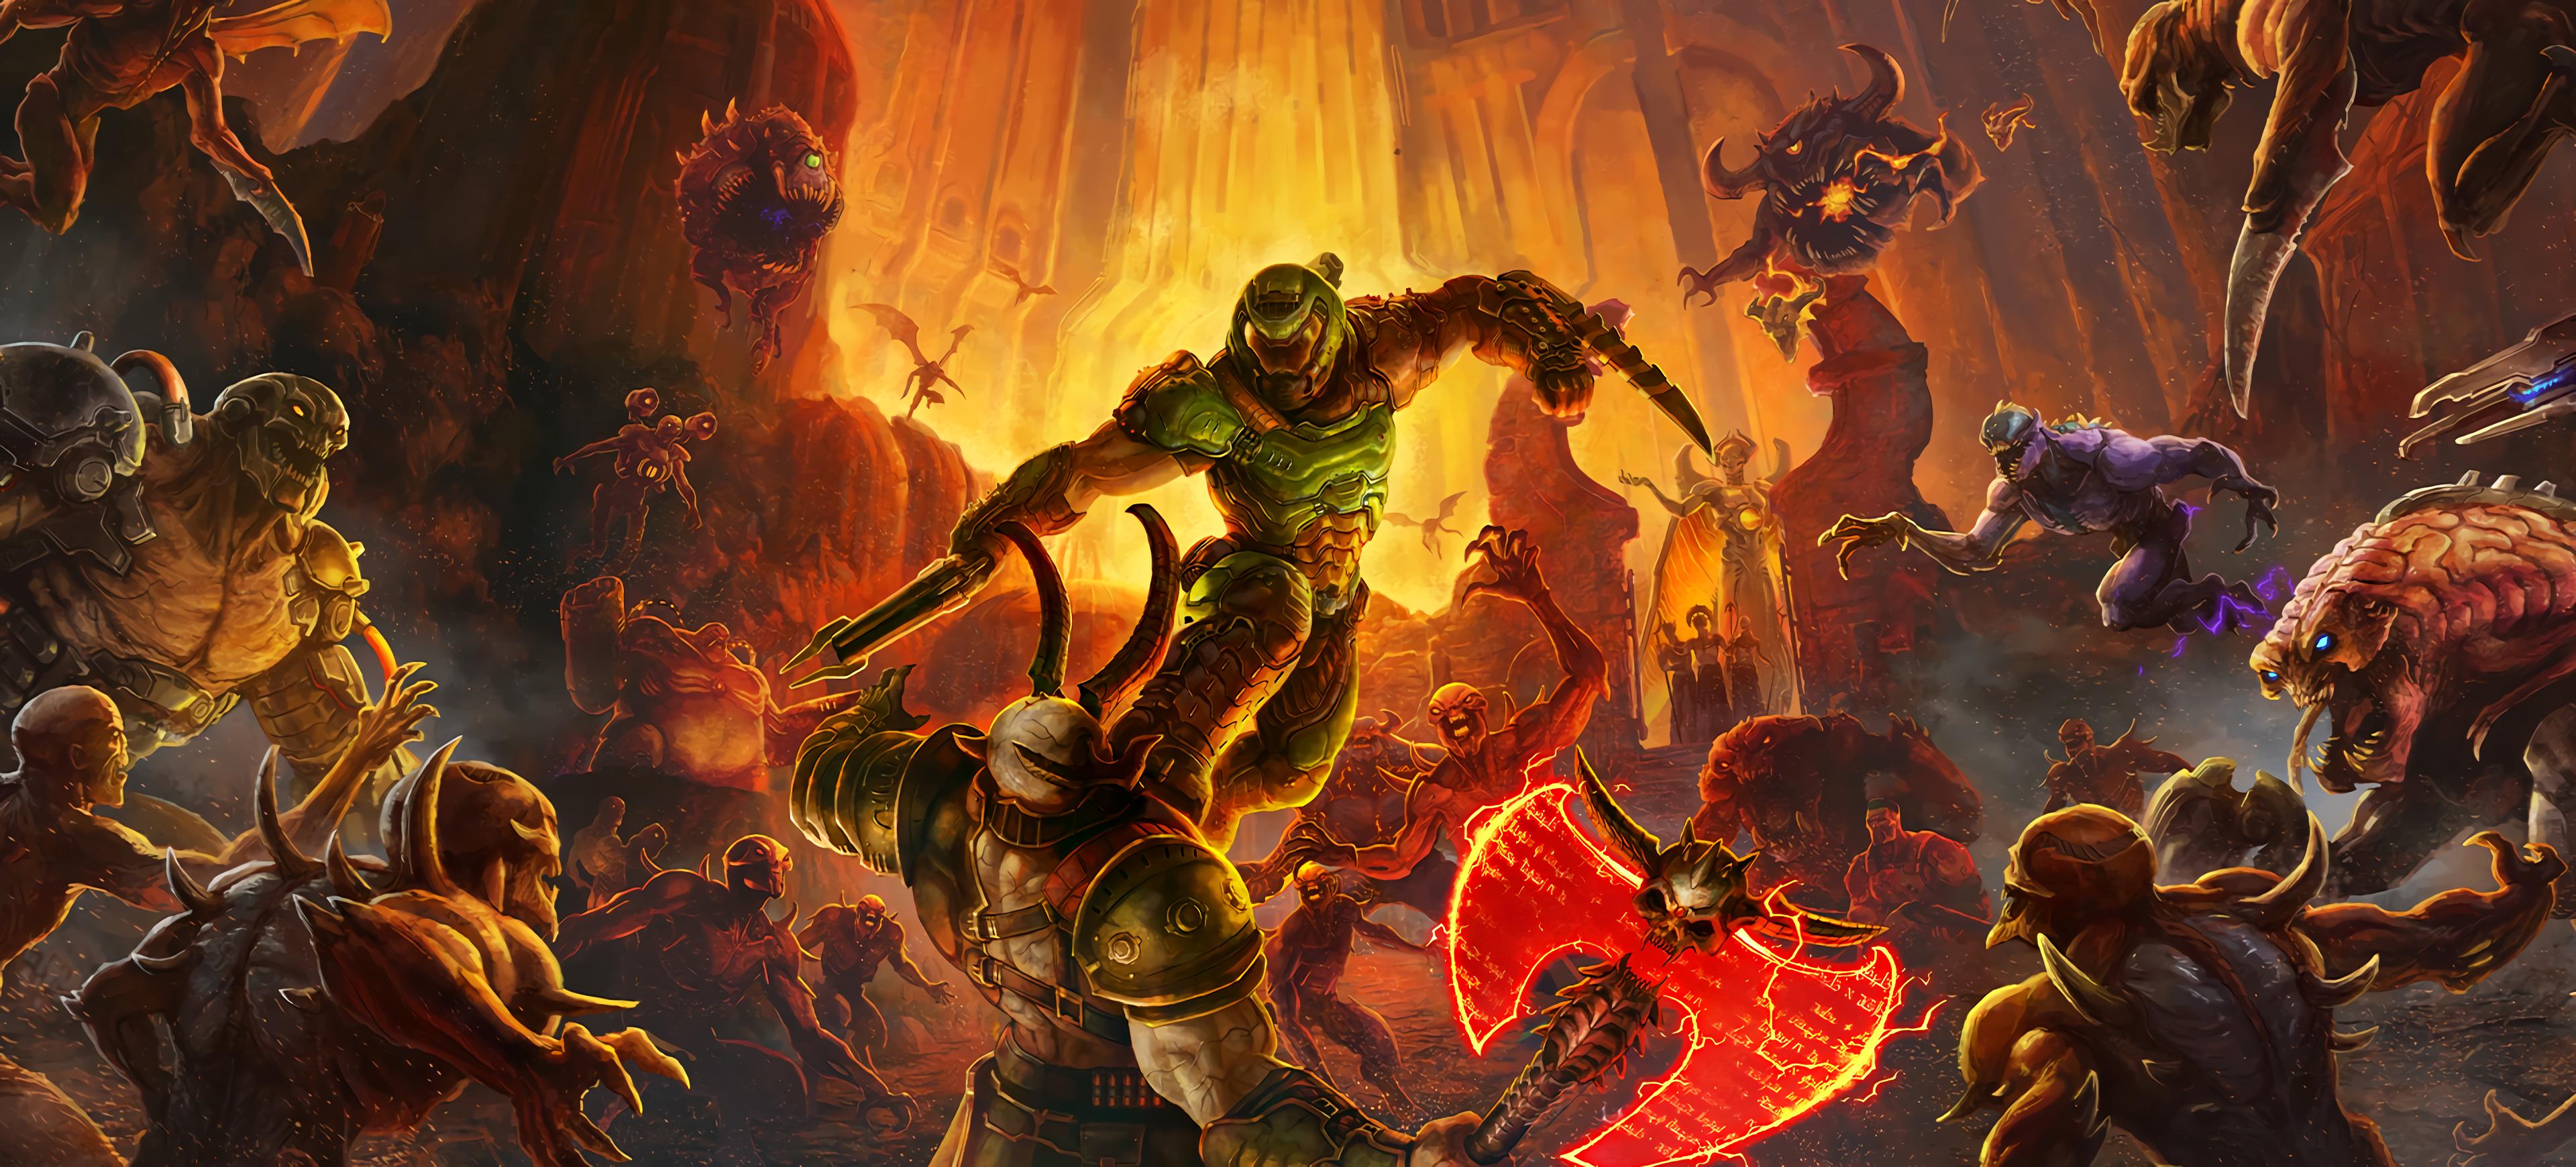 General 3840x1740 Doom (game) DOOM Eternal hell demon video games Bethesda Softworks Id Software artwork